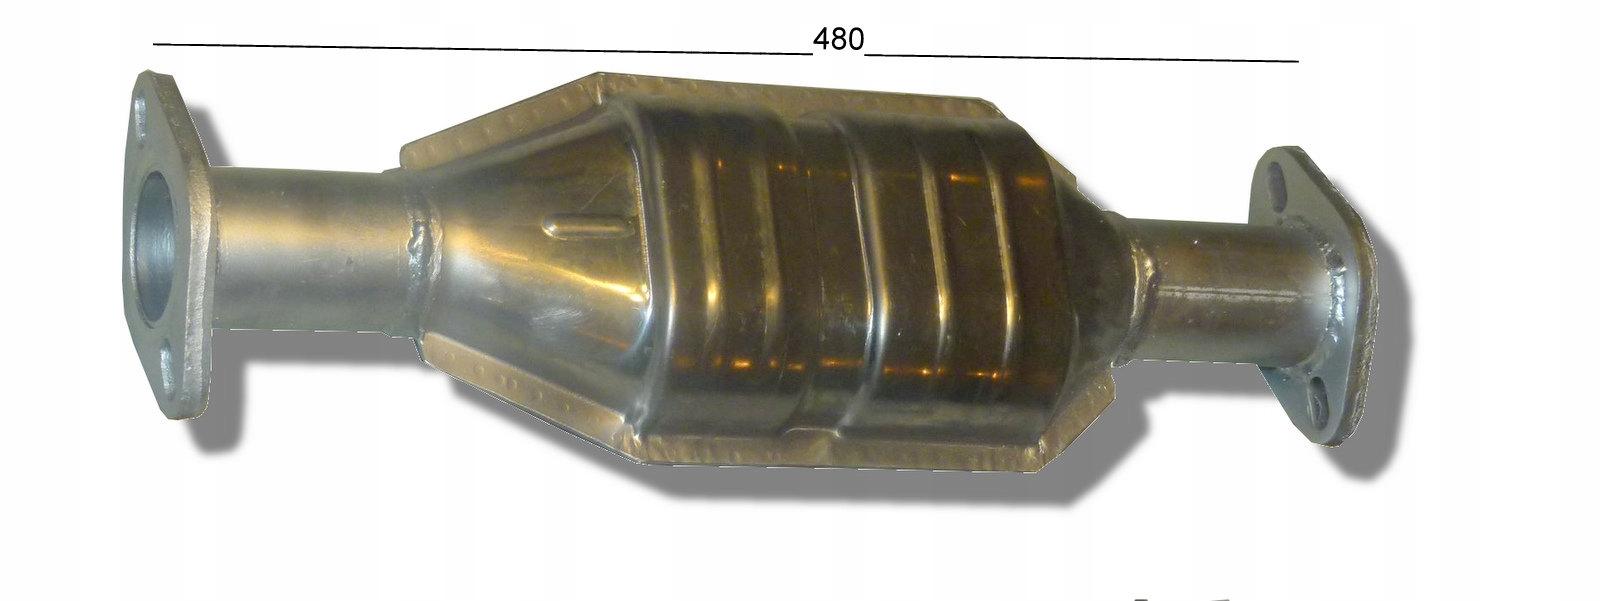 mitsubishi space star 18 катализатор strumienica